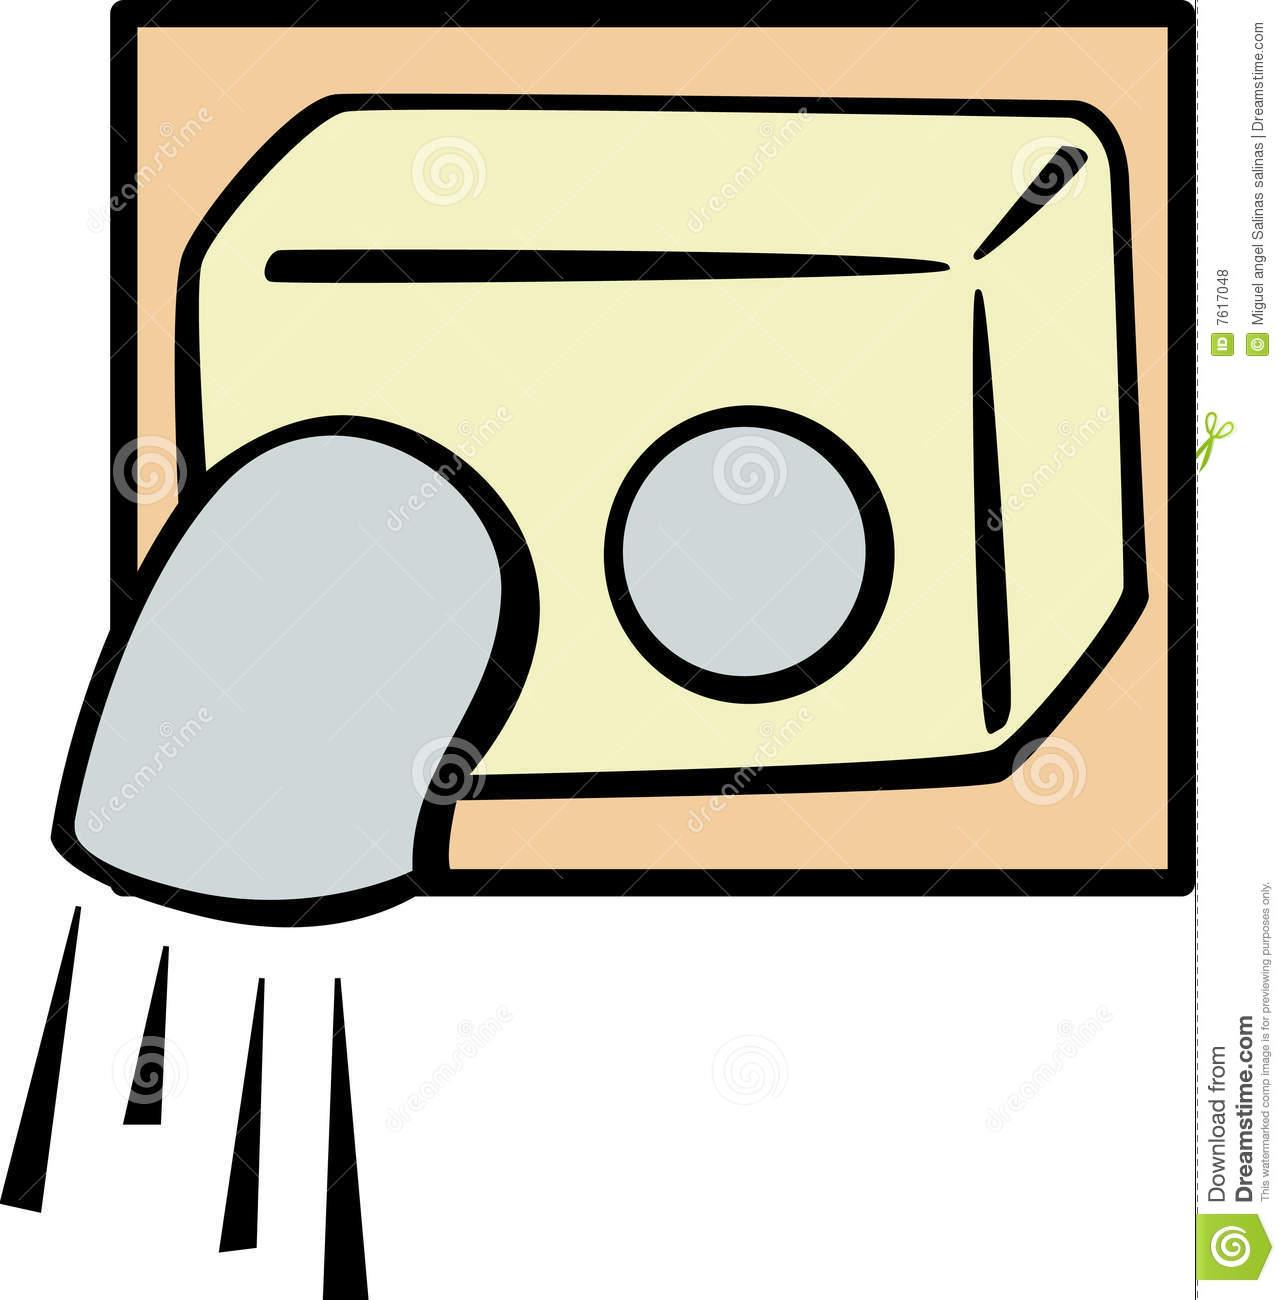 Hand Dryer Clipart.